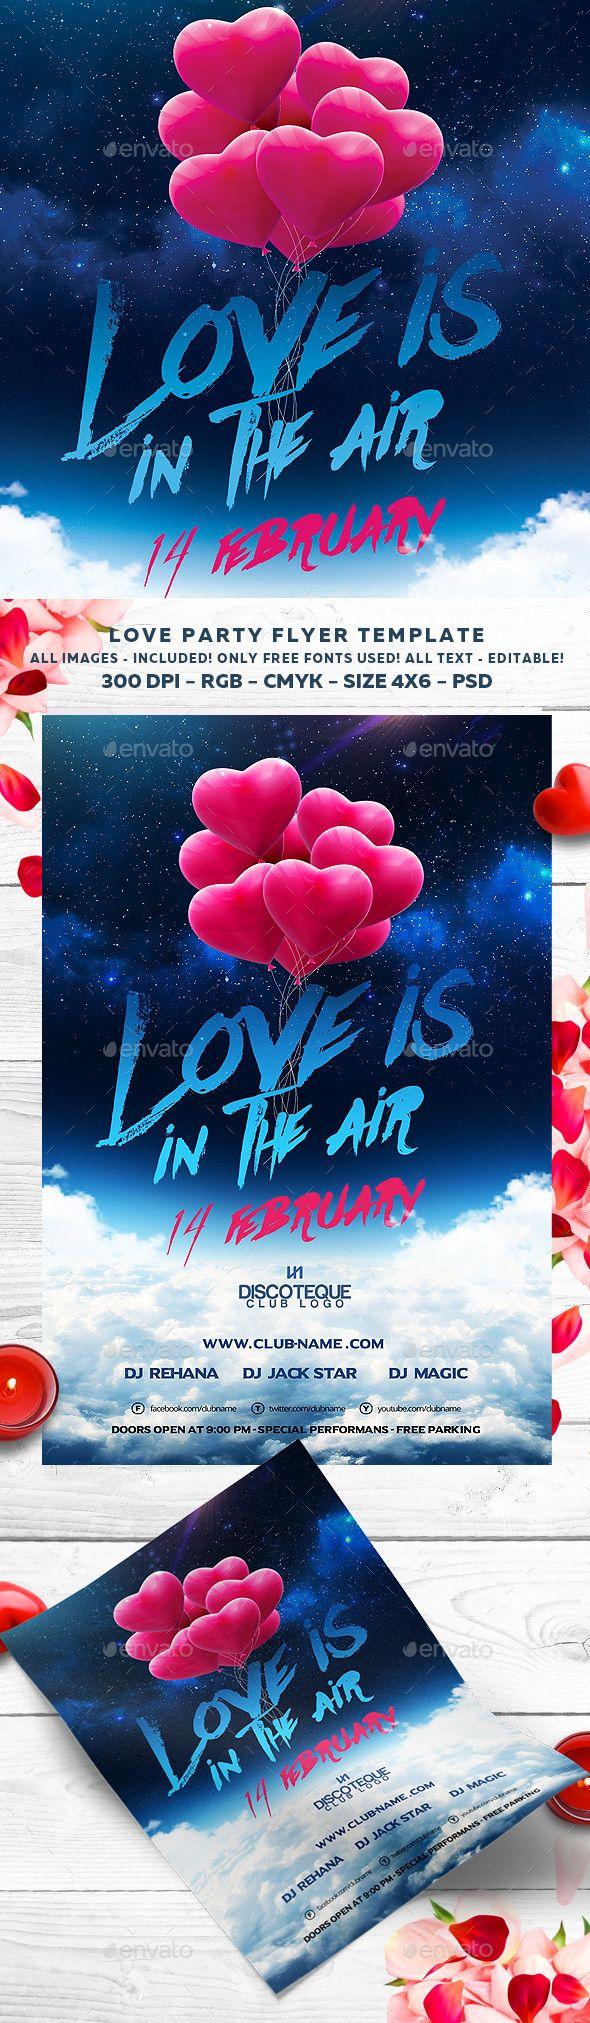 Valentines Day Flyer Template PSD #design Download: http://graphicriver.net/item/valentines-day-flyer/14485919?ref=ksioks